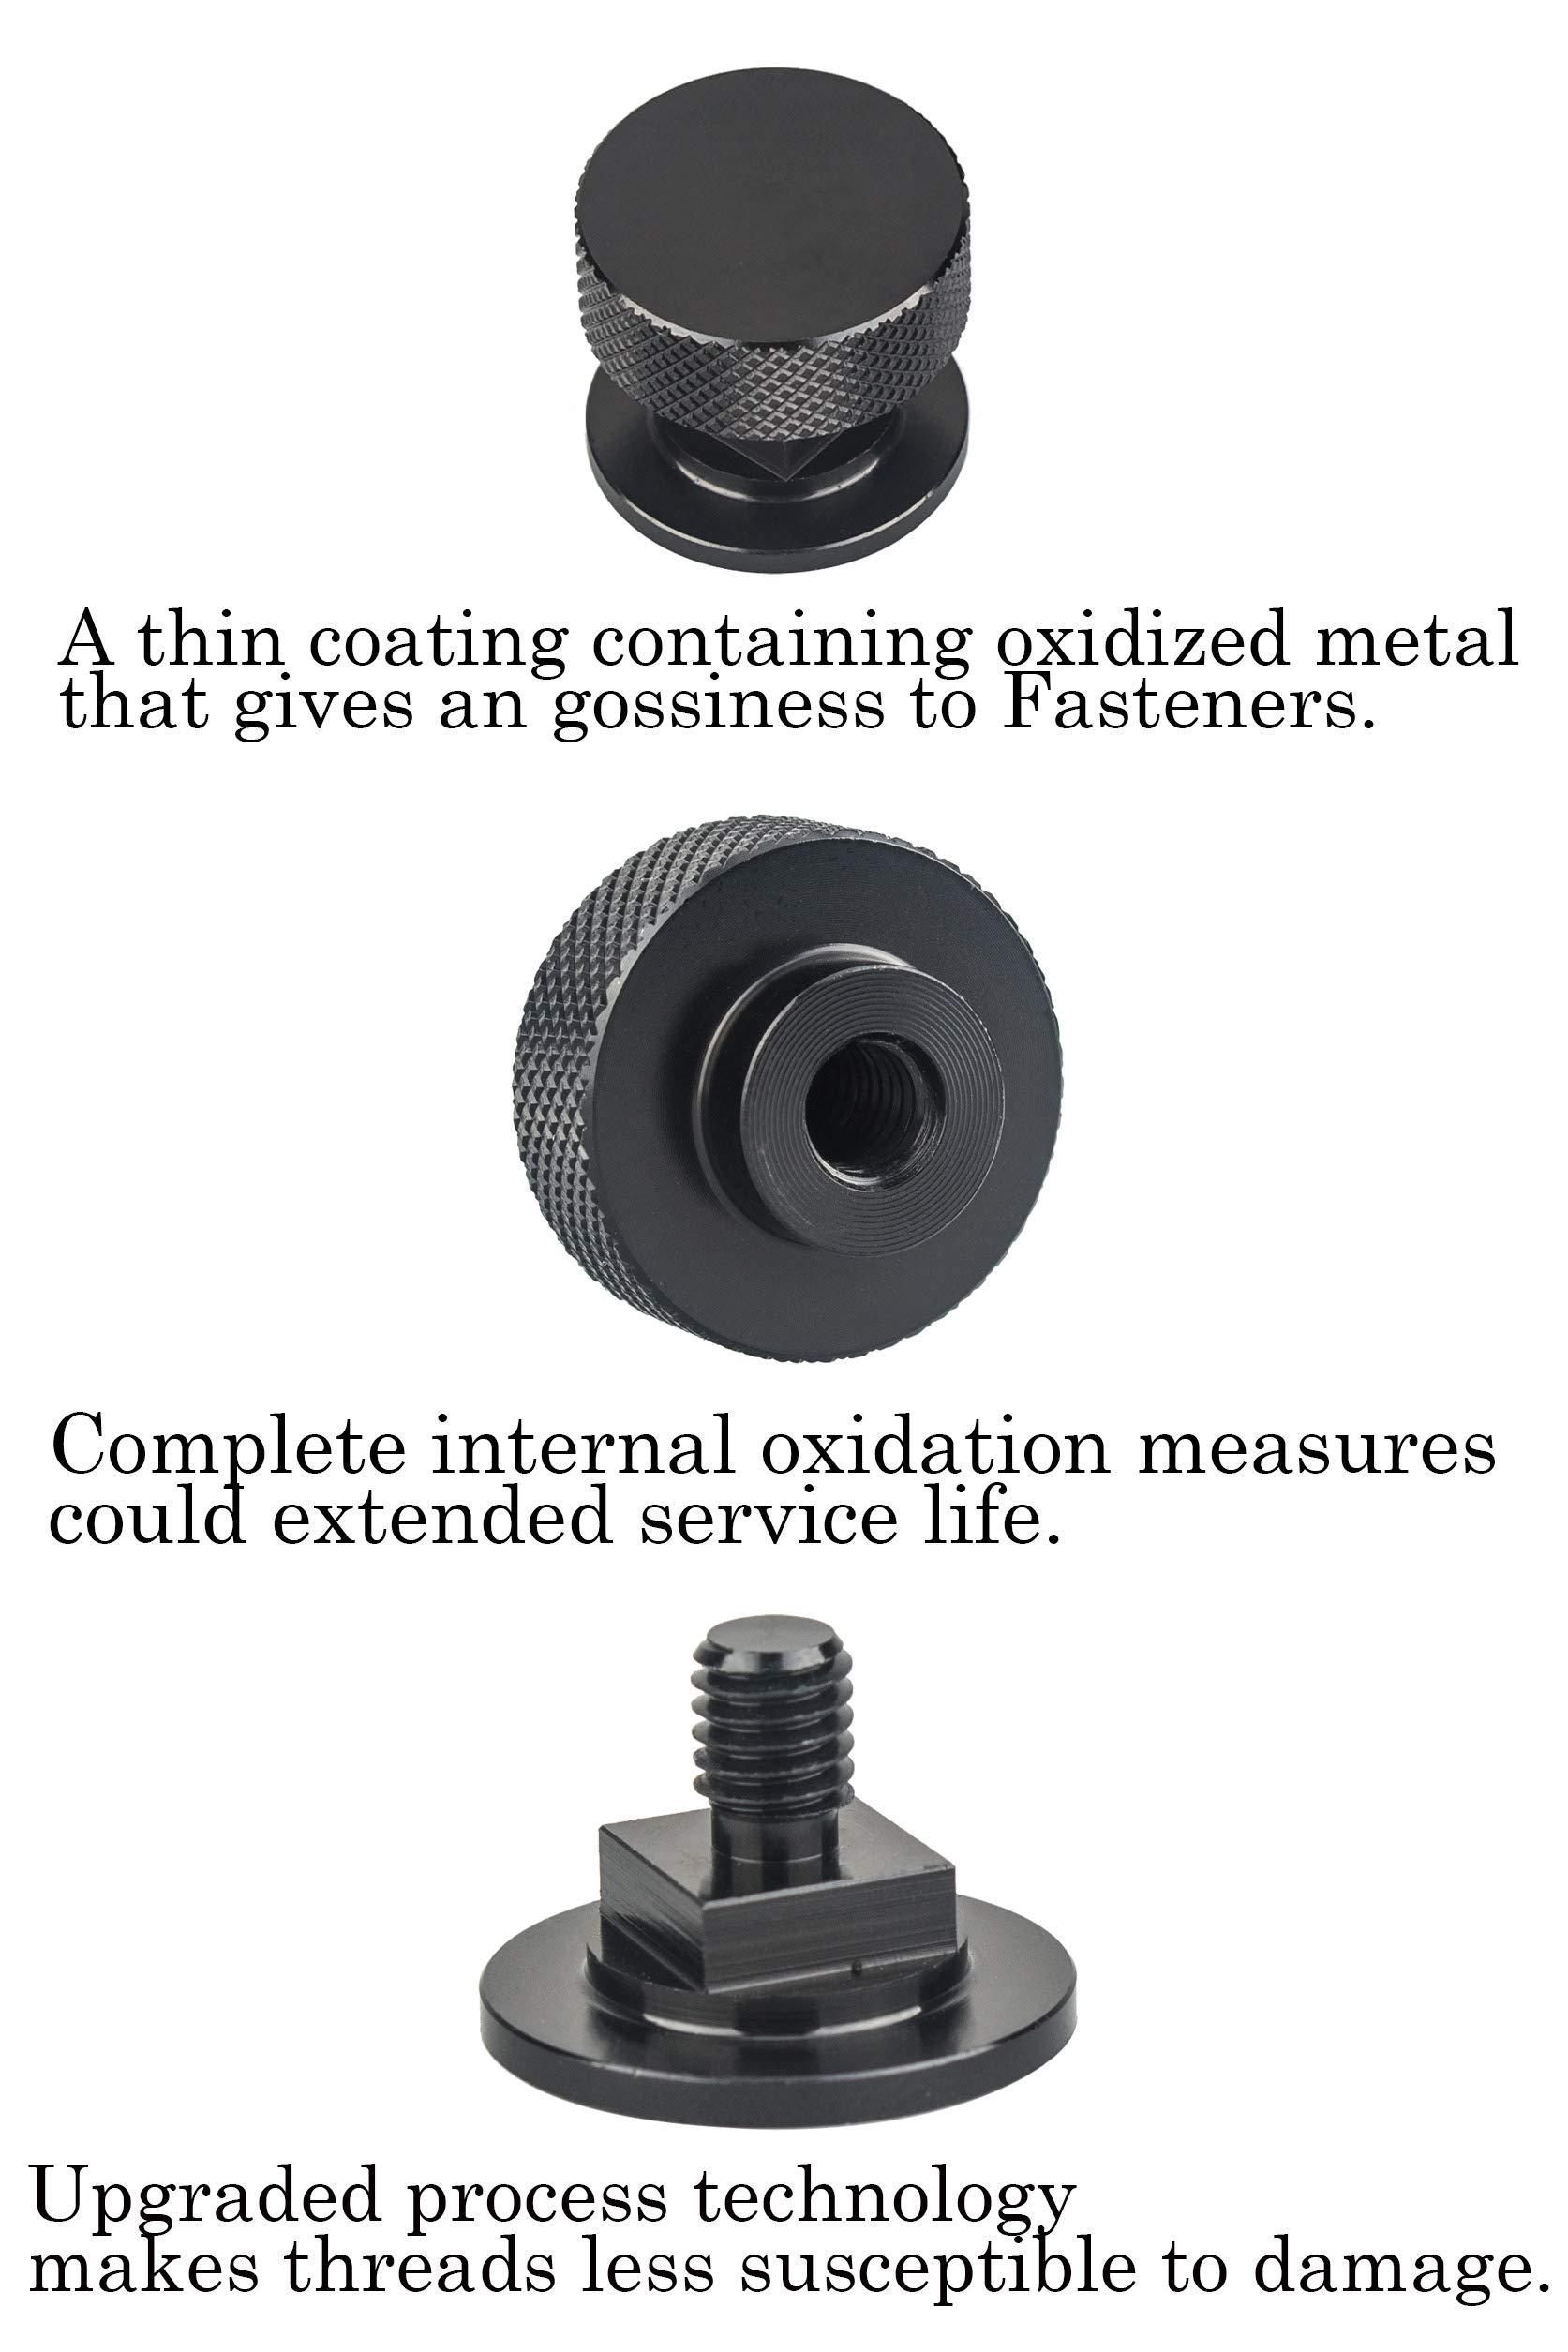 Welding Hood (Pipeliner) Helmet Fasteners Aluminum - 1 Pair (Black Anodized Knurled) by 3mirrors (Image #6)